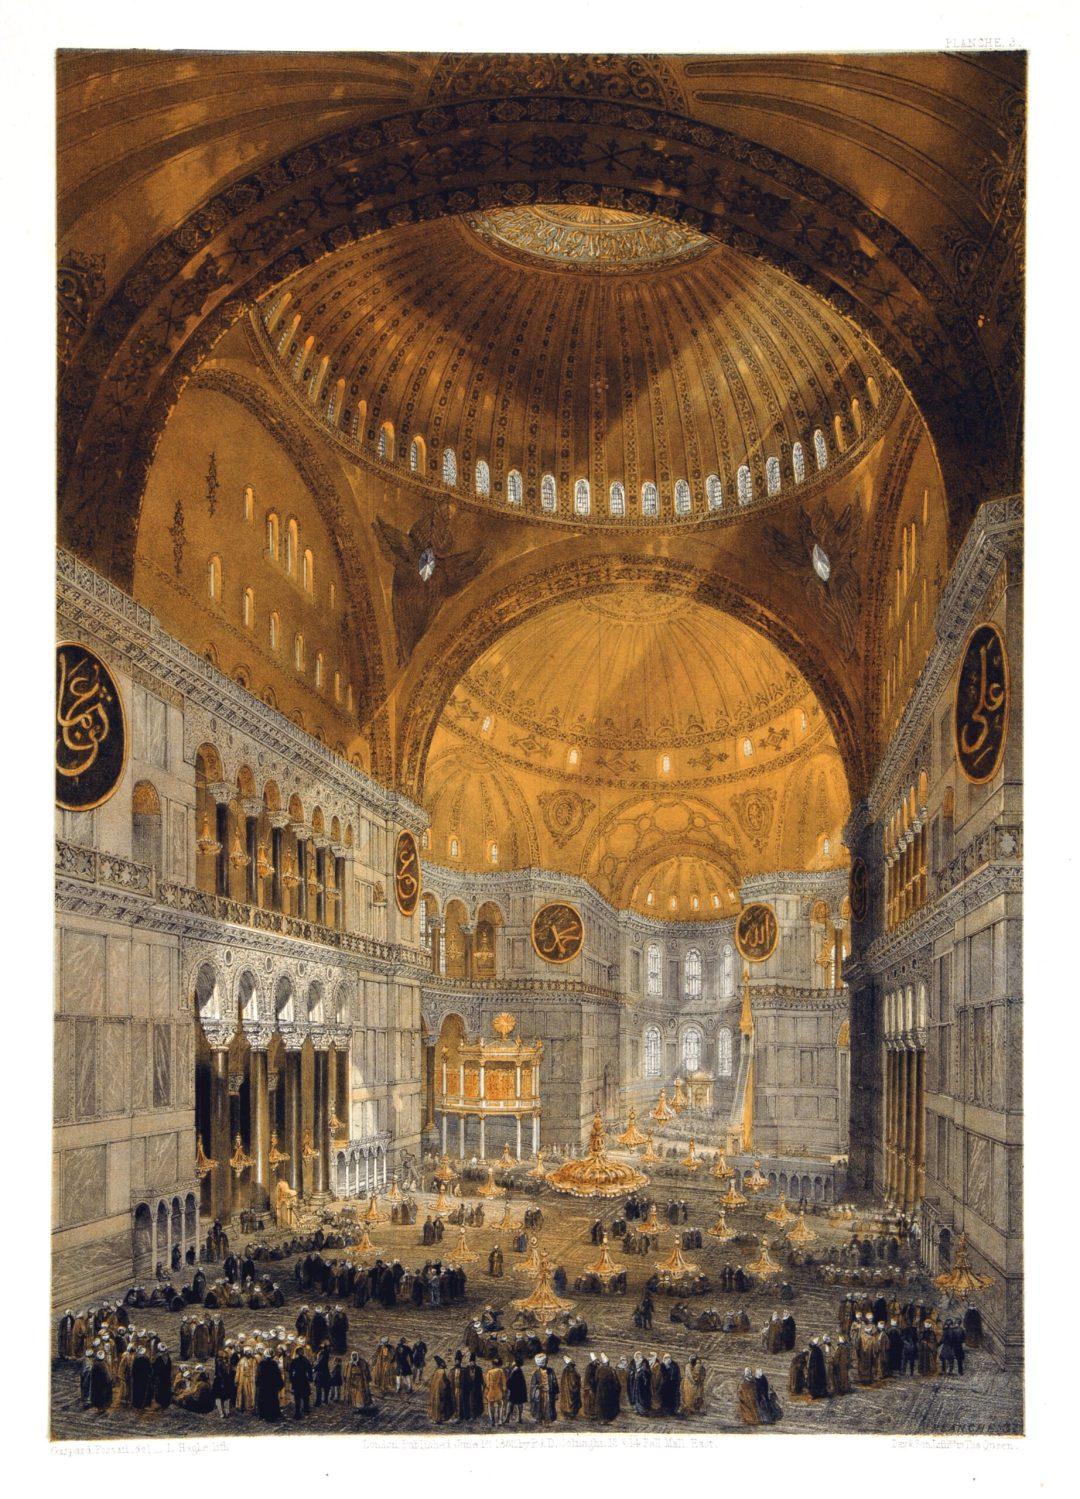 Hagia Sophia, Istanbul, Turkey - interior (1852) by Gaspare Fossati.